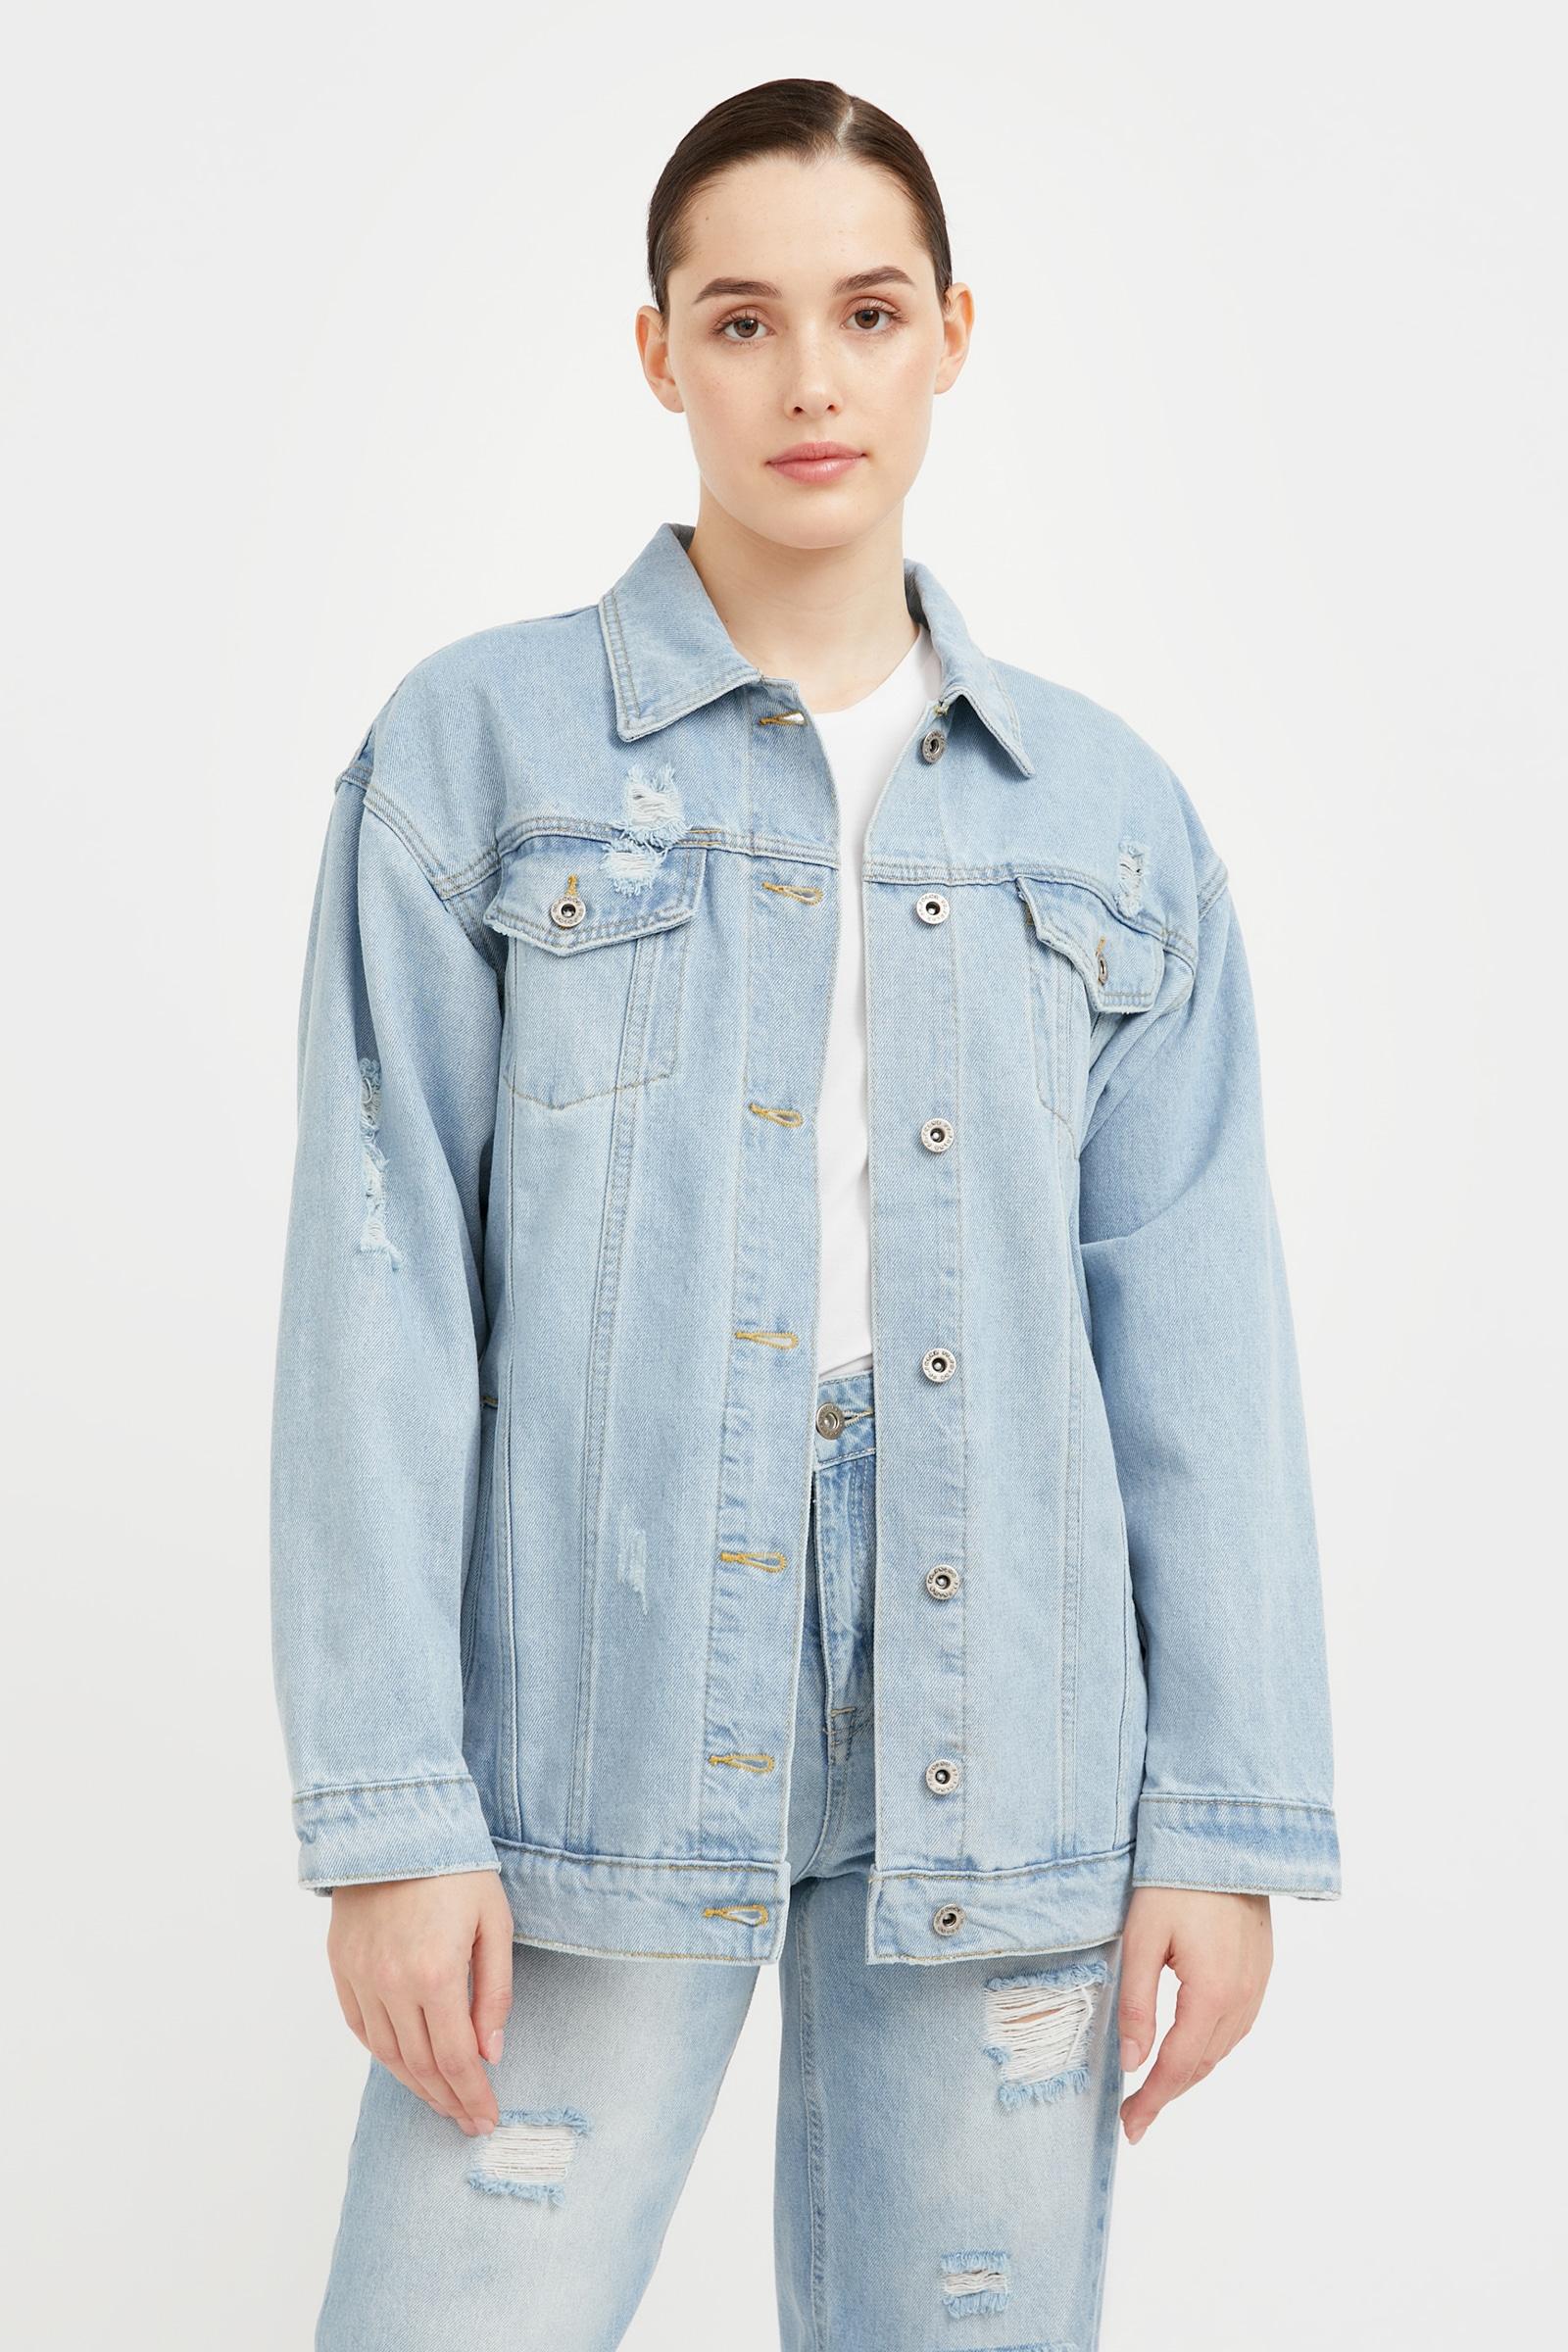 finn flare -  Jeansjacke, mit Used-Waschung